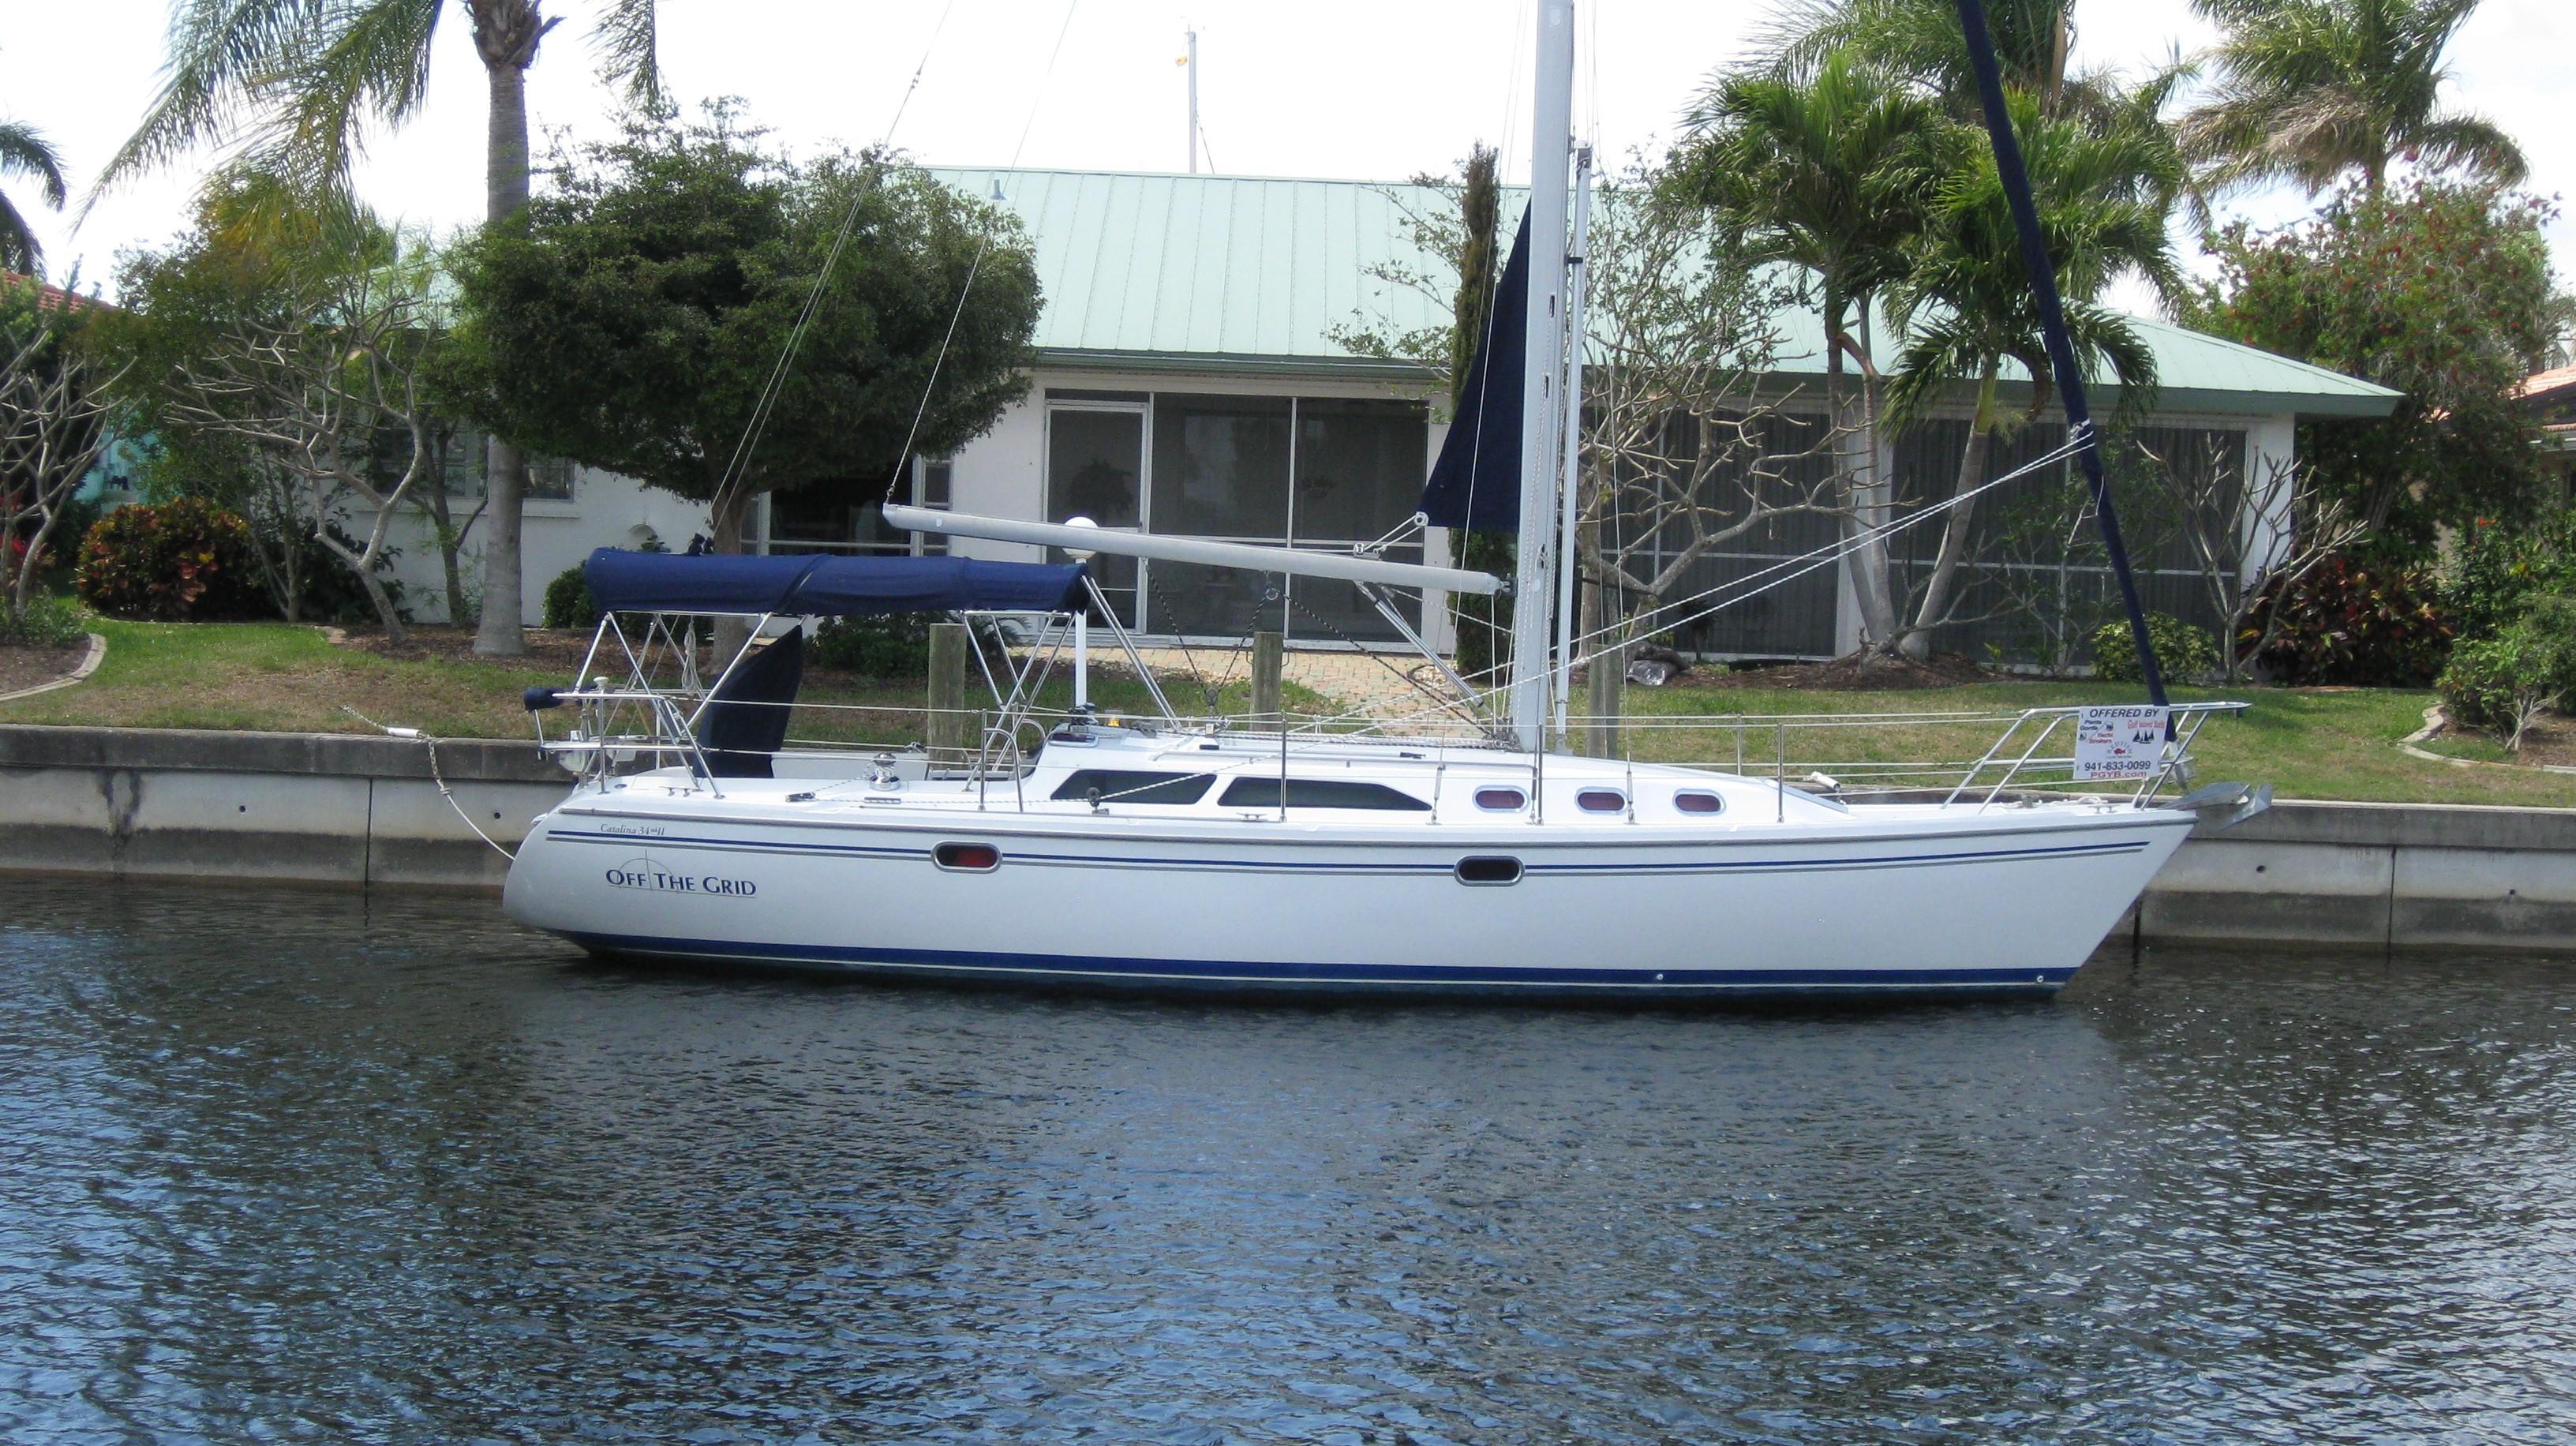 2005 catalina 34 mkii sail boat for sale www yachtworld com rh yachtworld com 1986 catalina 34 owners manual Catalina 27 Sailboat